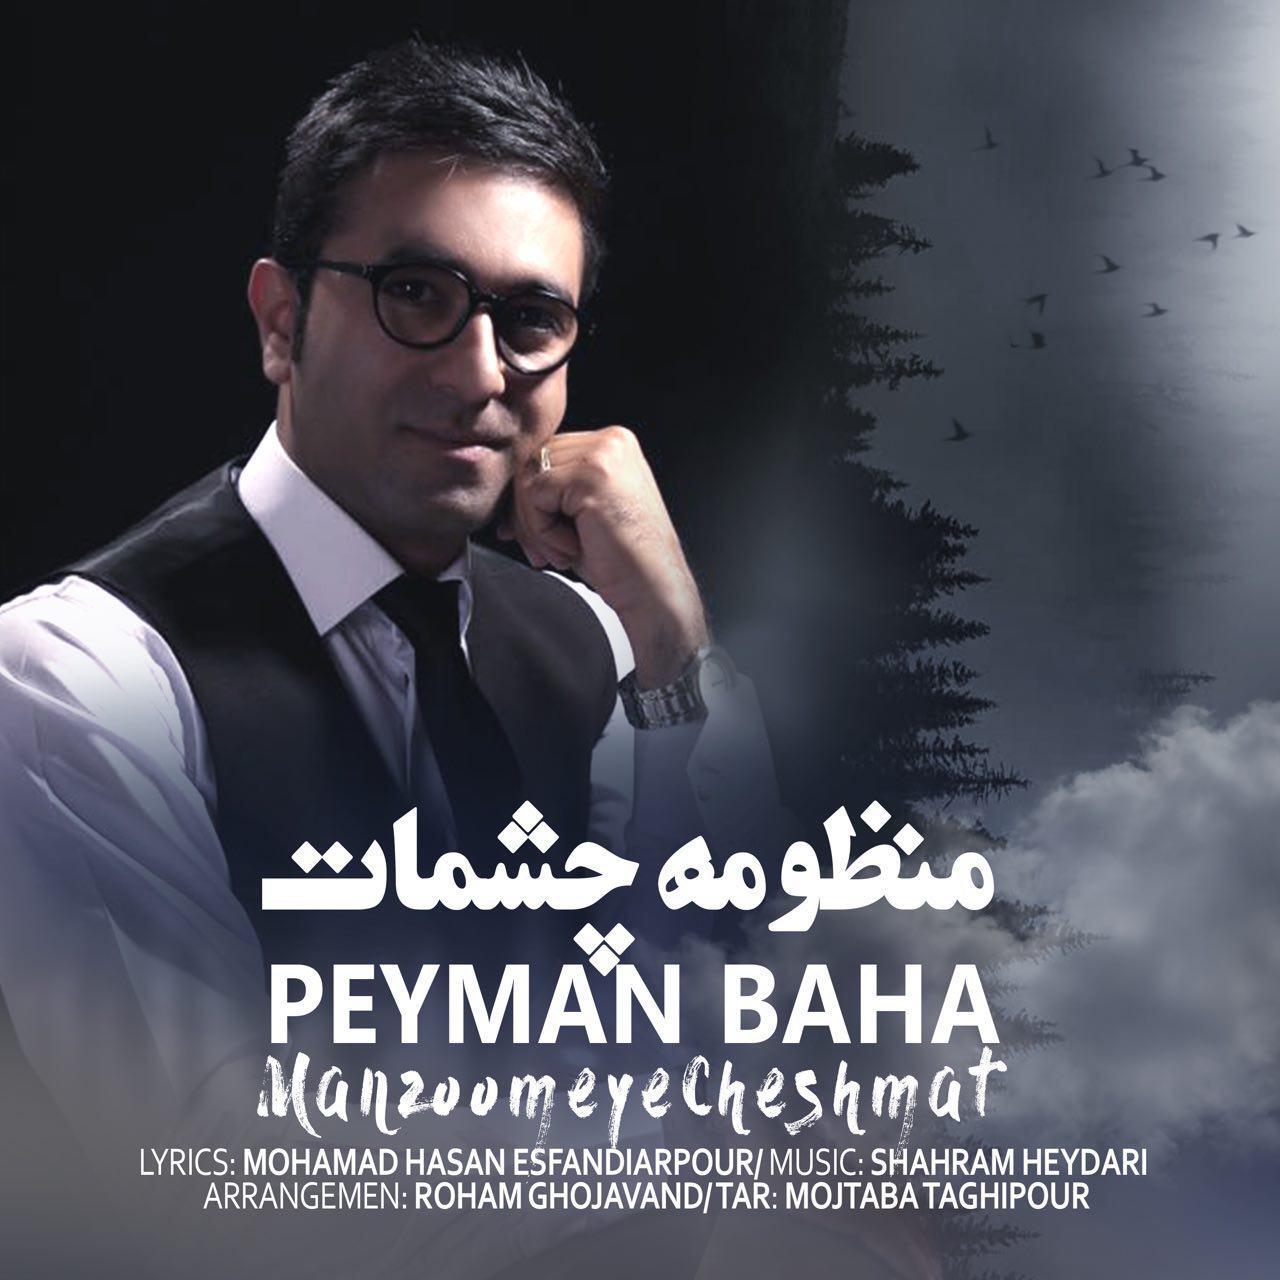 Peyman Baha – Manzoomeye Cheshmat